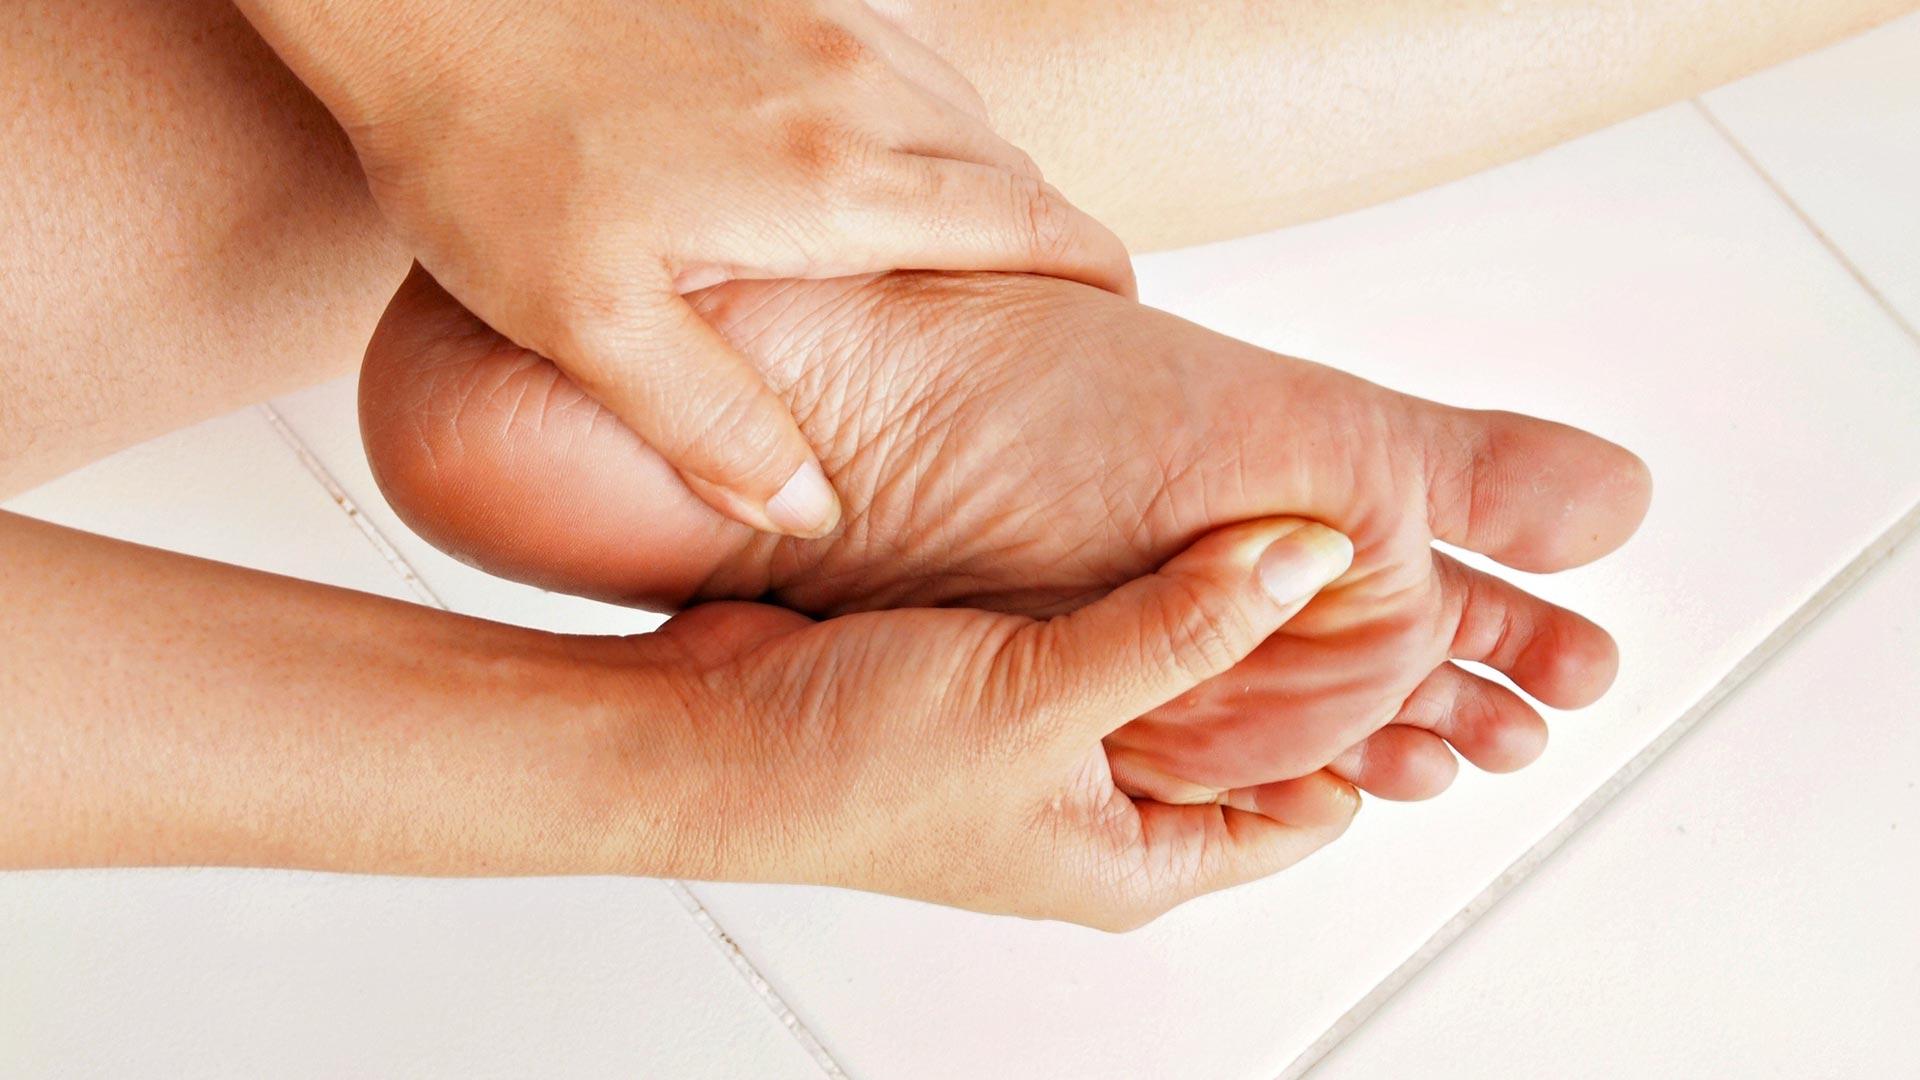 Jalkojen hoitaminen diabetes